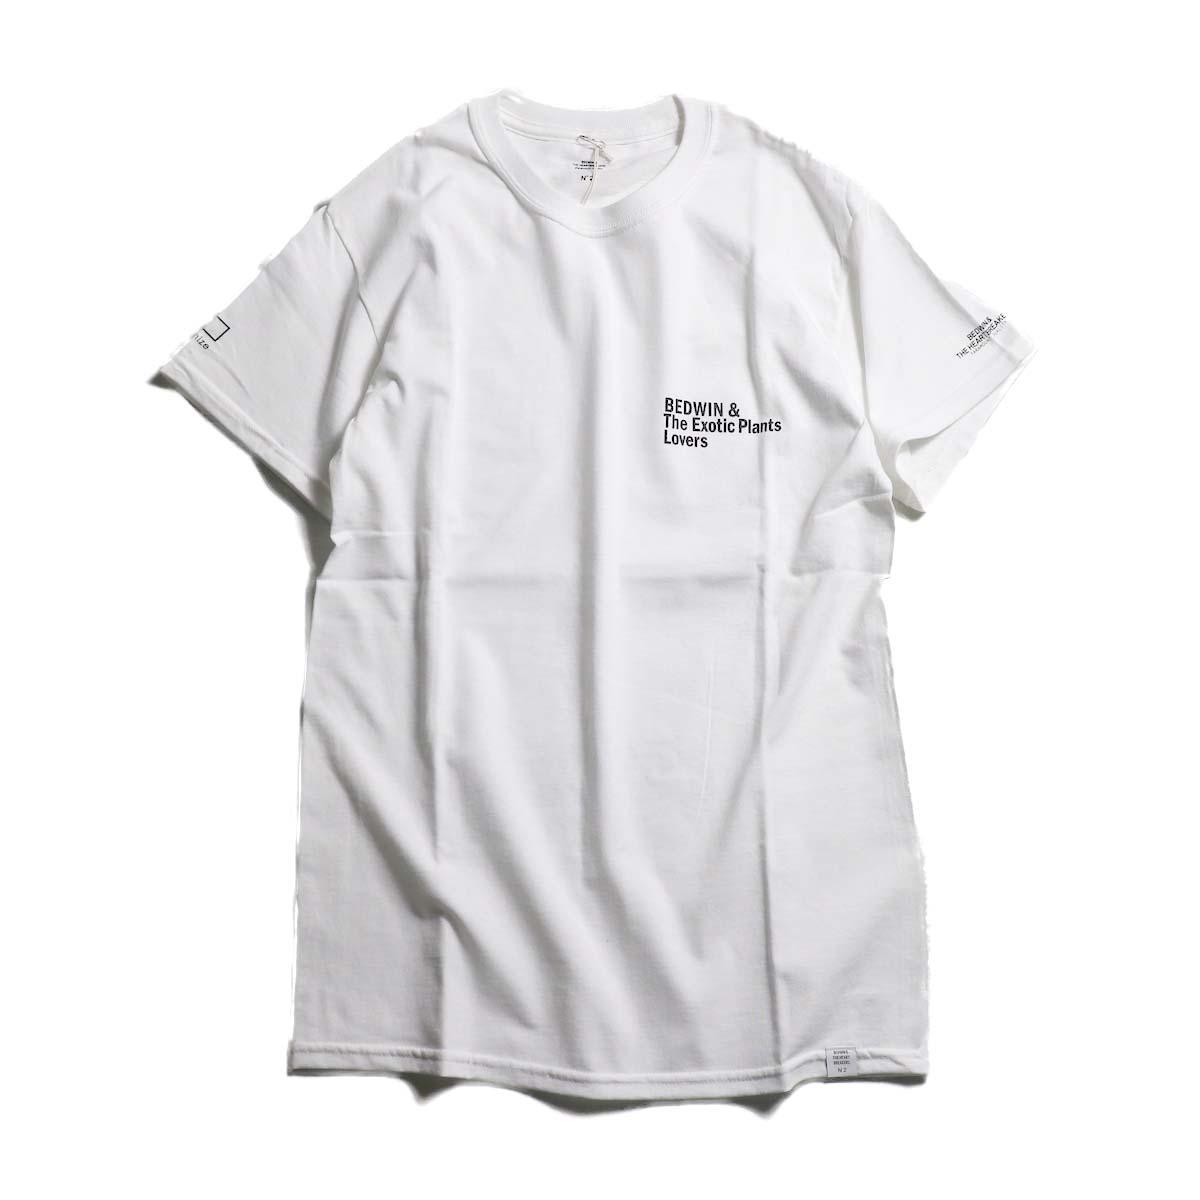 BEDWIN & THE HEARTBREAKERS × BOTANIZE Back Print T-Shirts